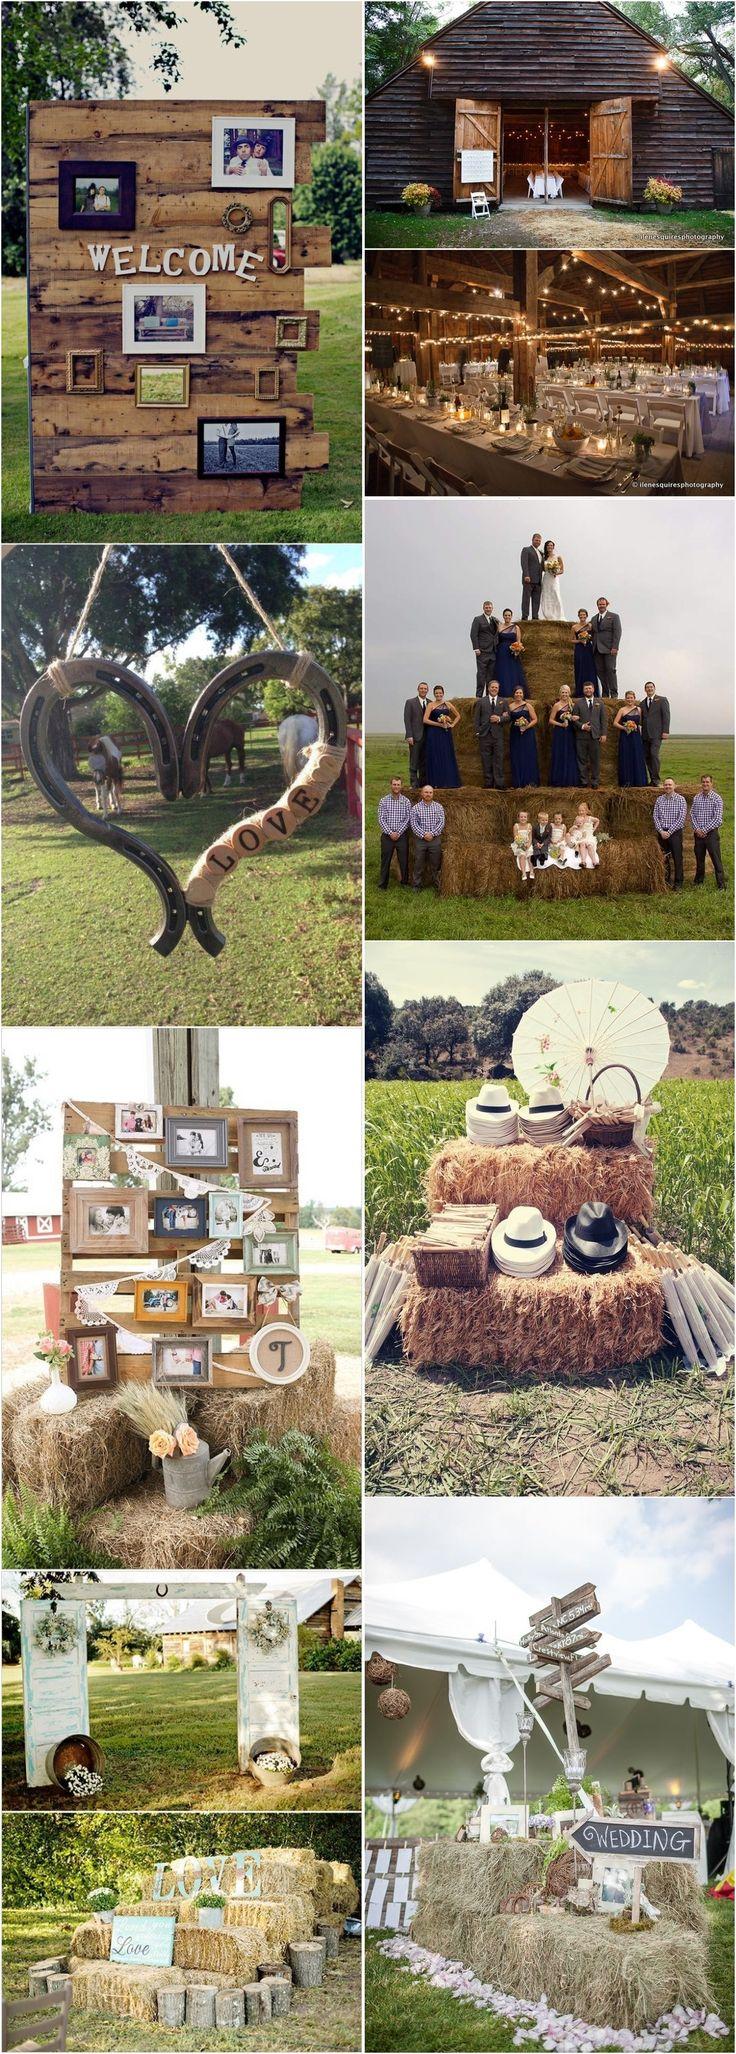 Best 25 Camo wedding decorations ideas on Pinterest  Redneck wedding decorations Country